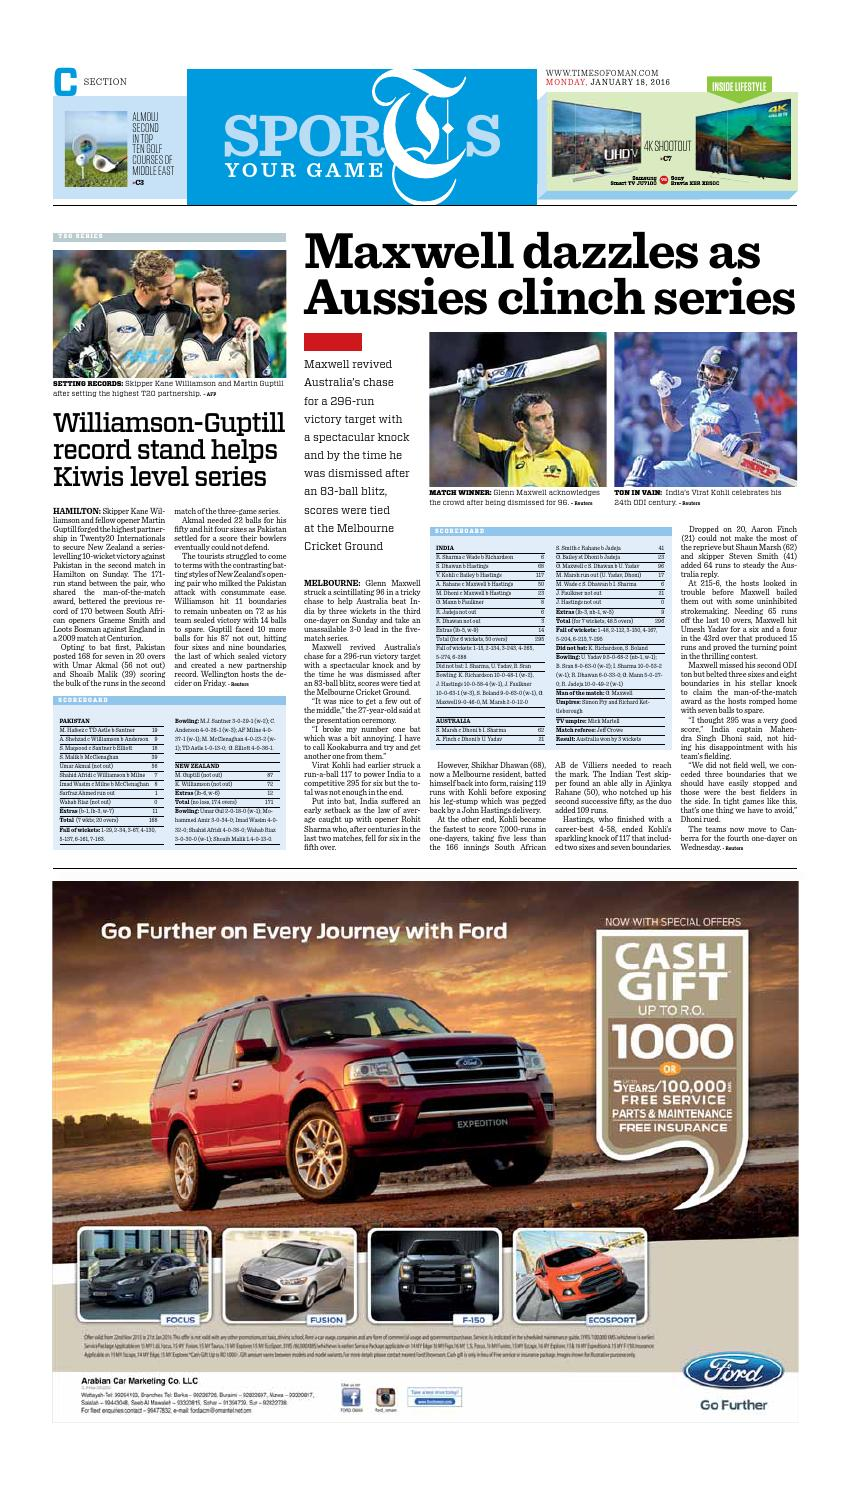 Times of Oman - January 18, 2016